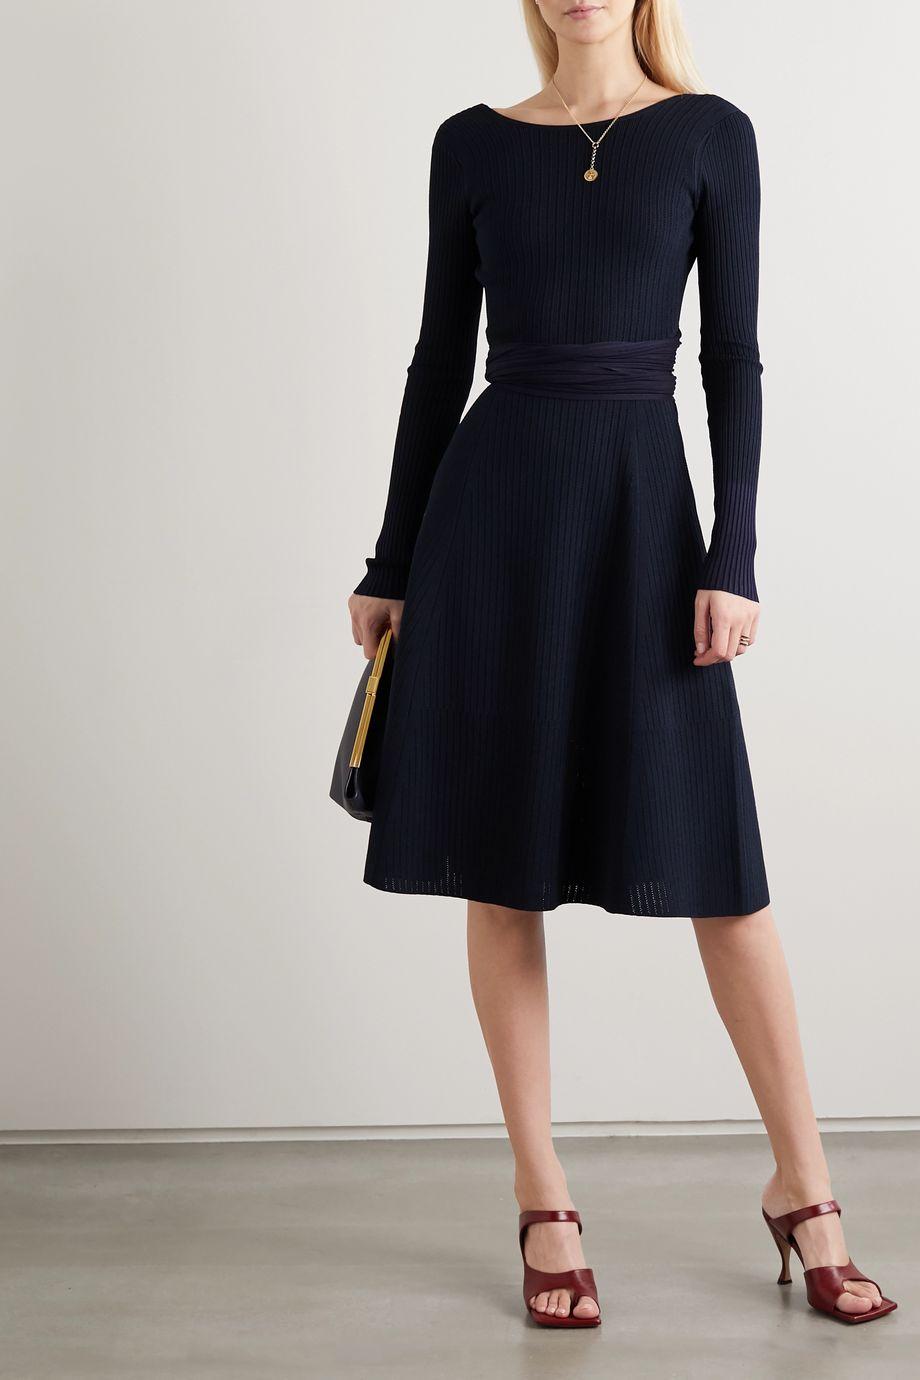 Victoria Beckham Tie-detailed ribbed-knit midi dress